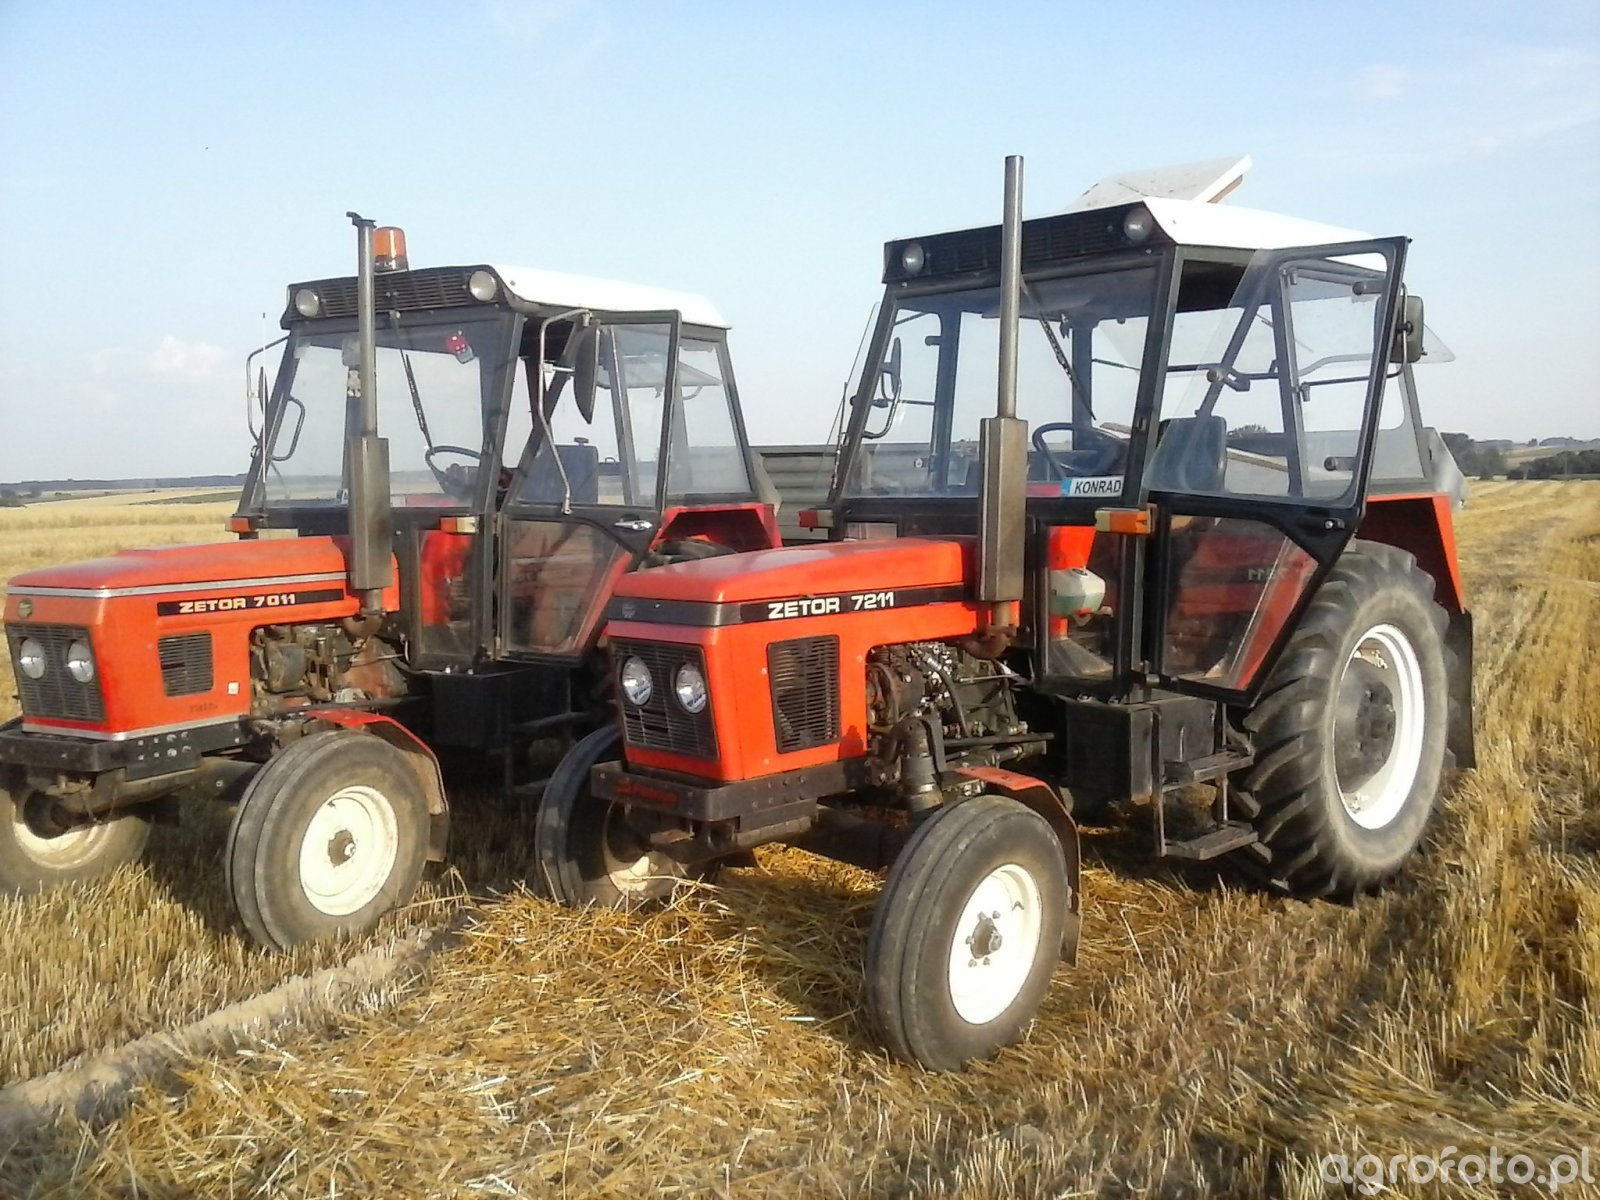 Zetor 7011 & 7211